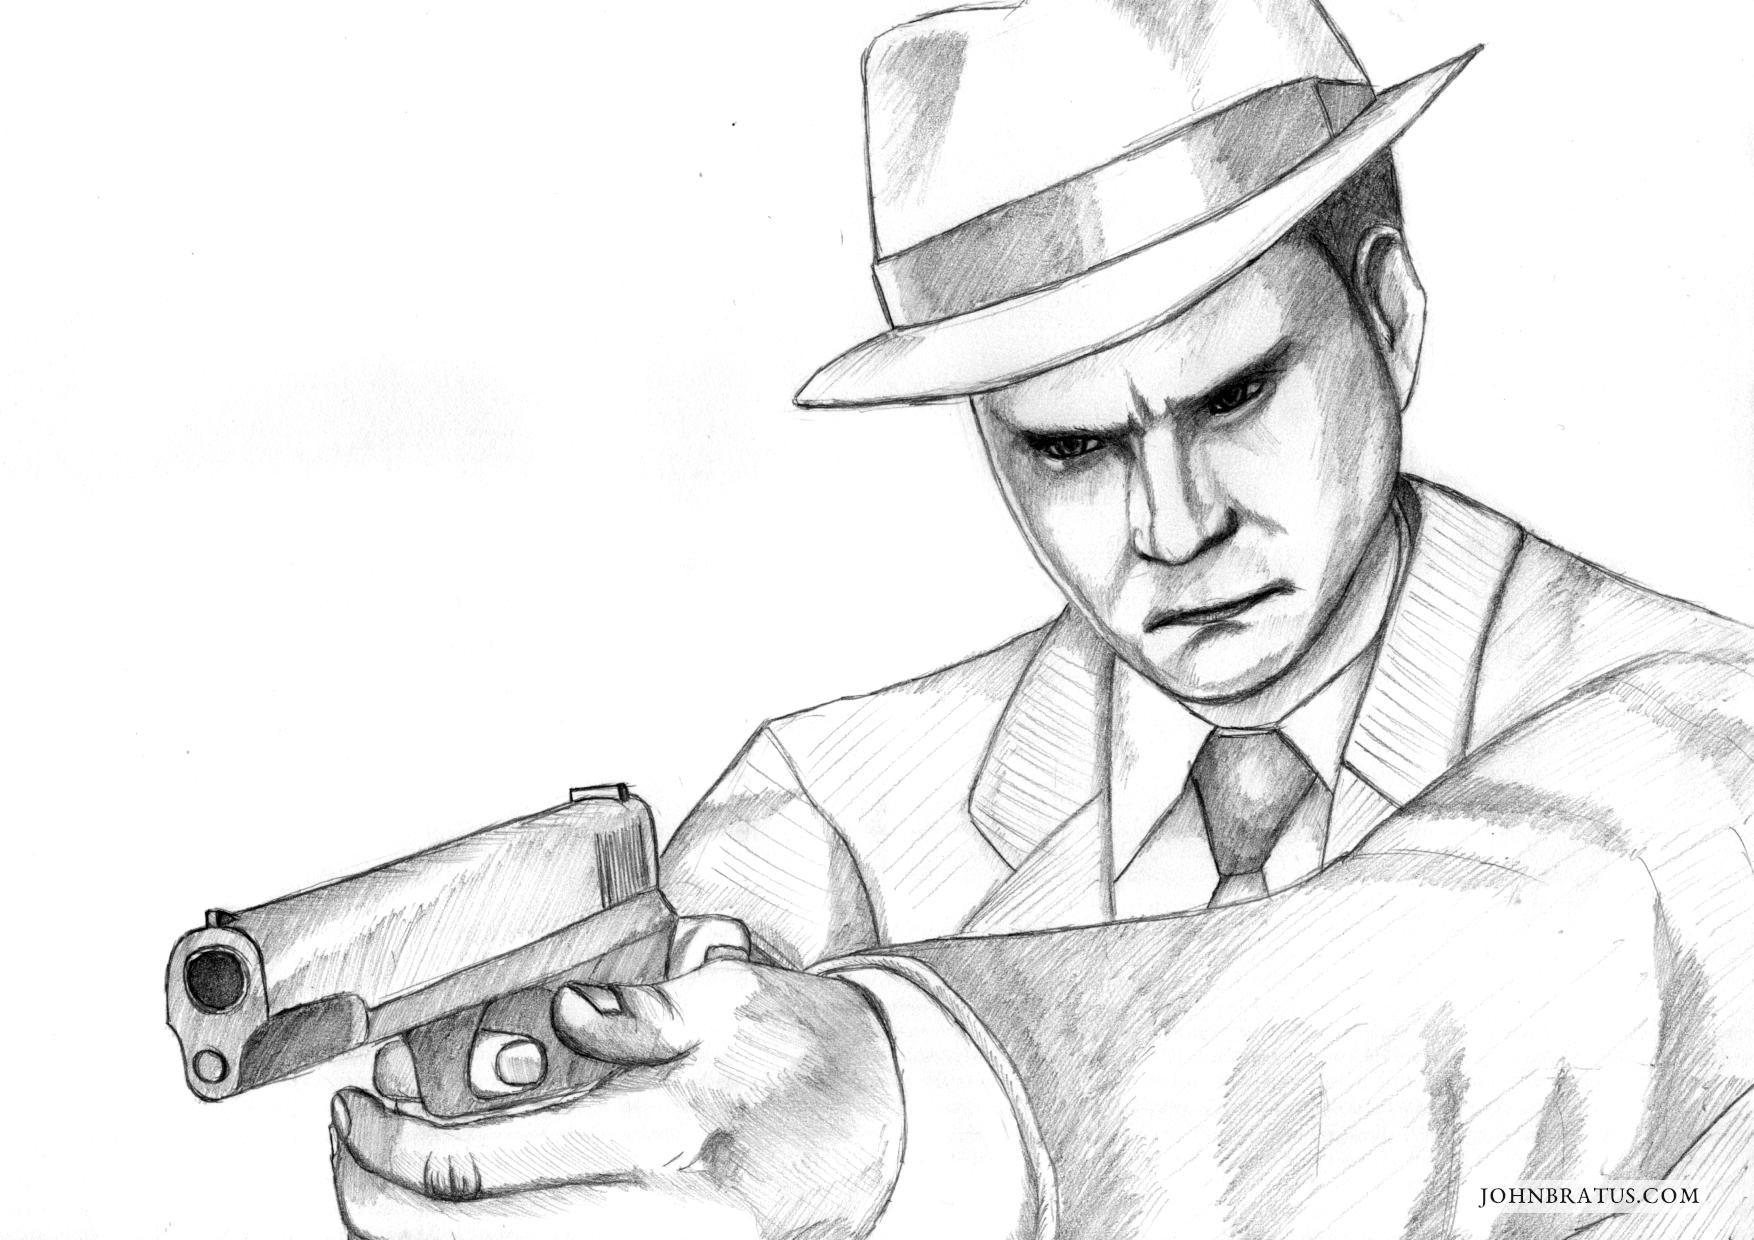 Pencil fanart drawing of the L.A. Noire detective Cole Phelps